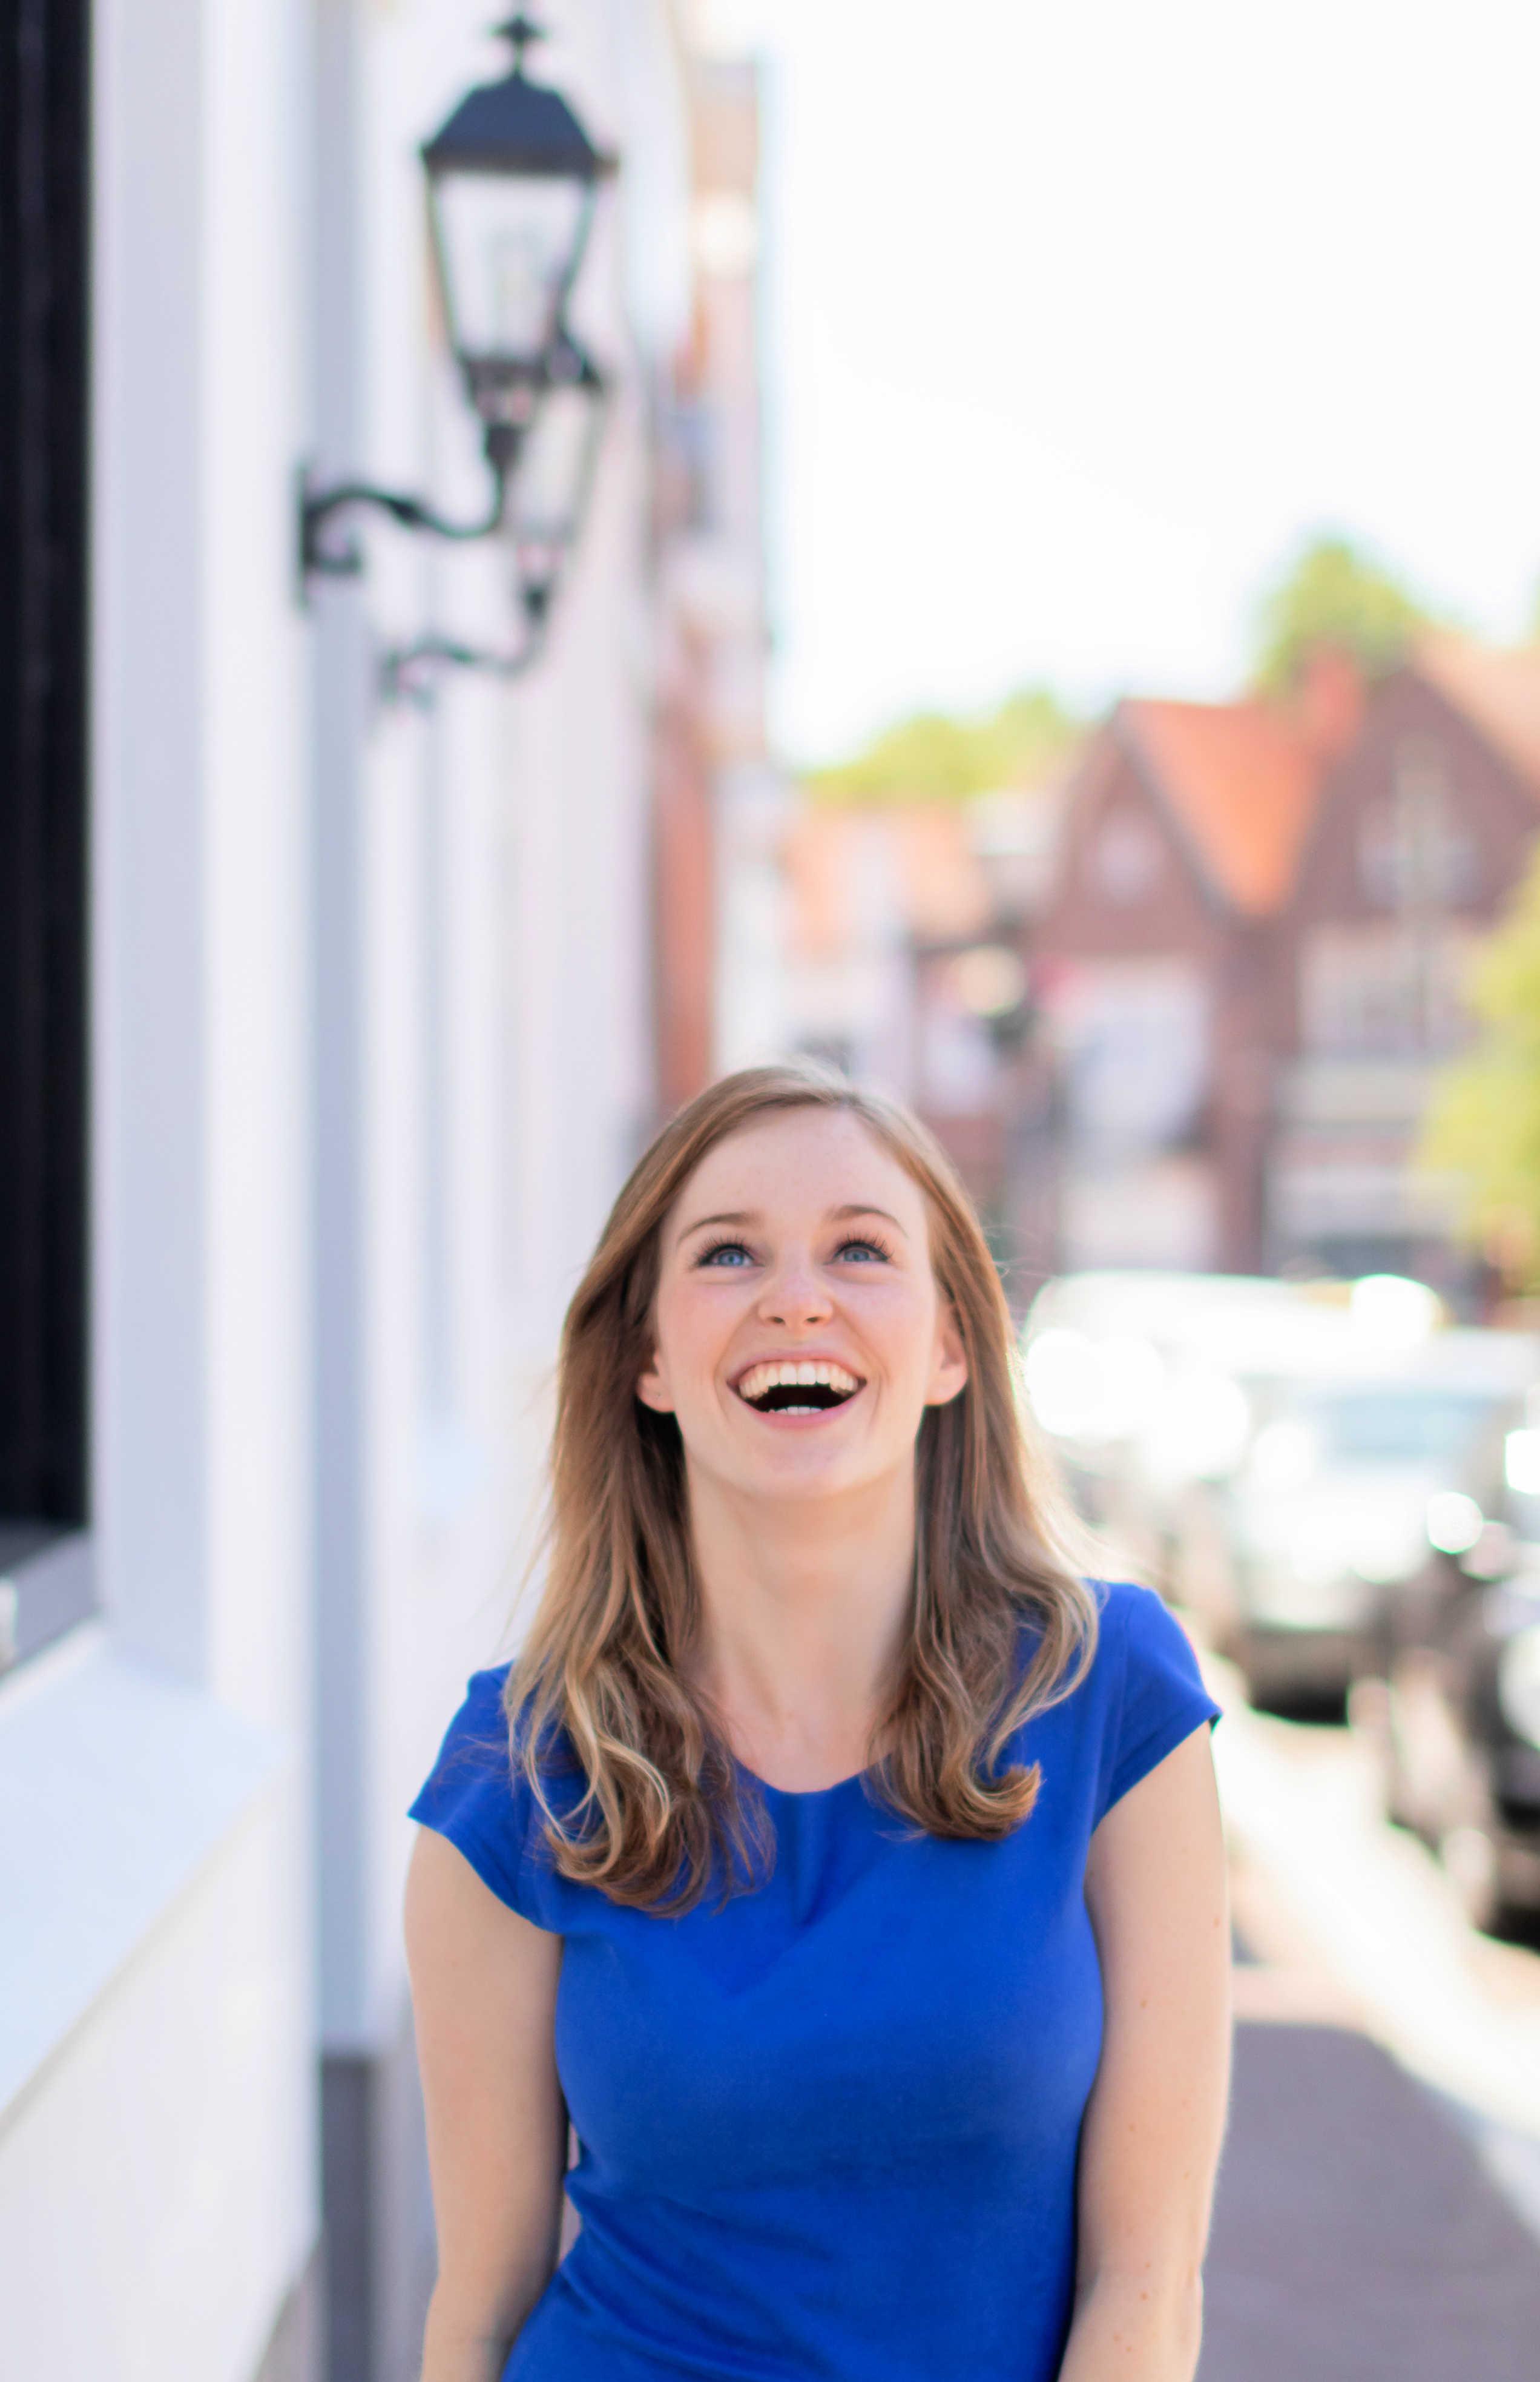 Elodie Kint ondernemer freelance journalist